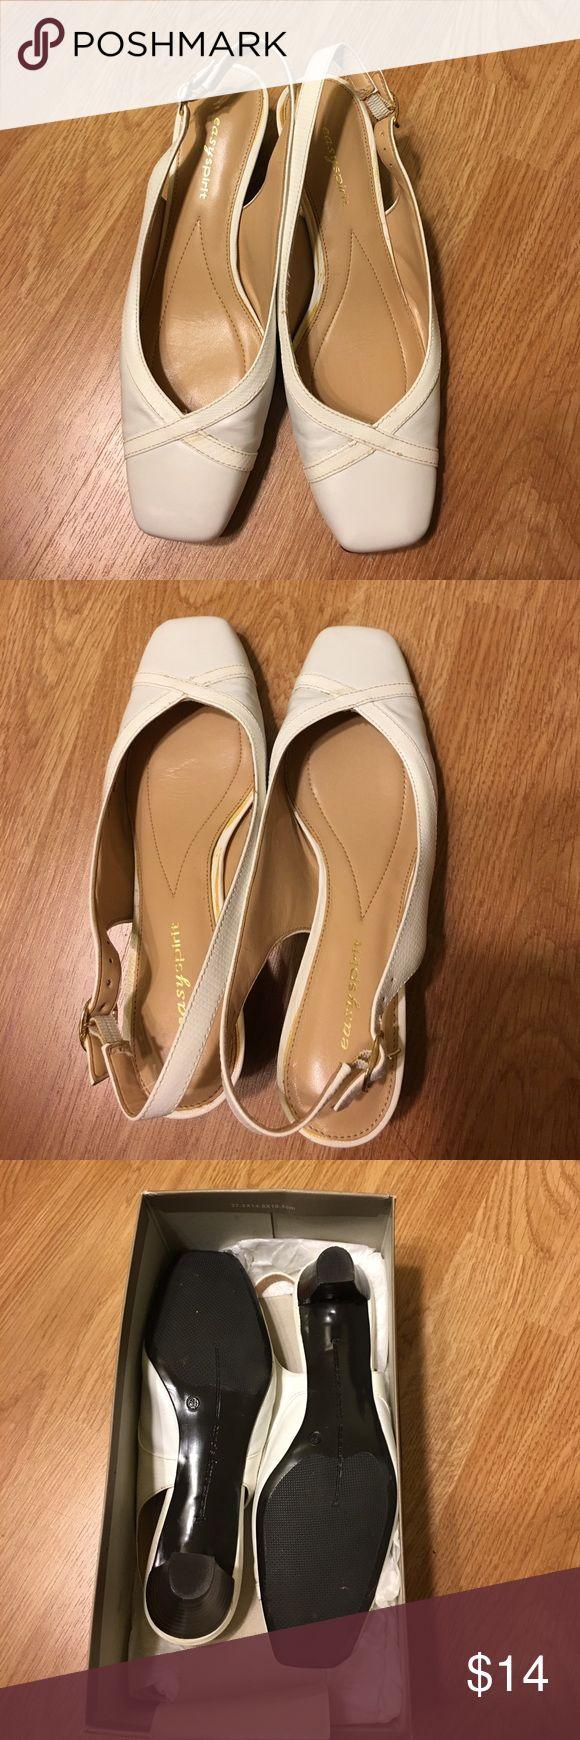 Easy Spirit sandals, lightly used, white color Easy Spirit sandals, lightly used, excellent condition, white color Easy Spirit Shoes